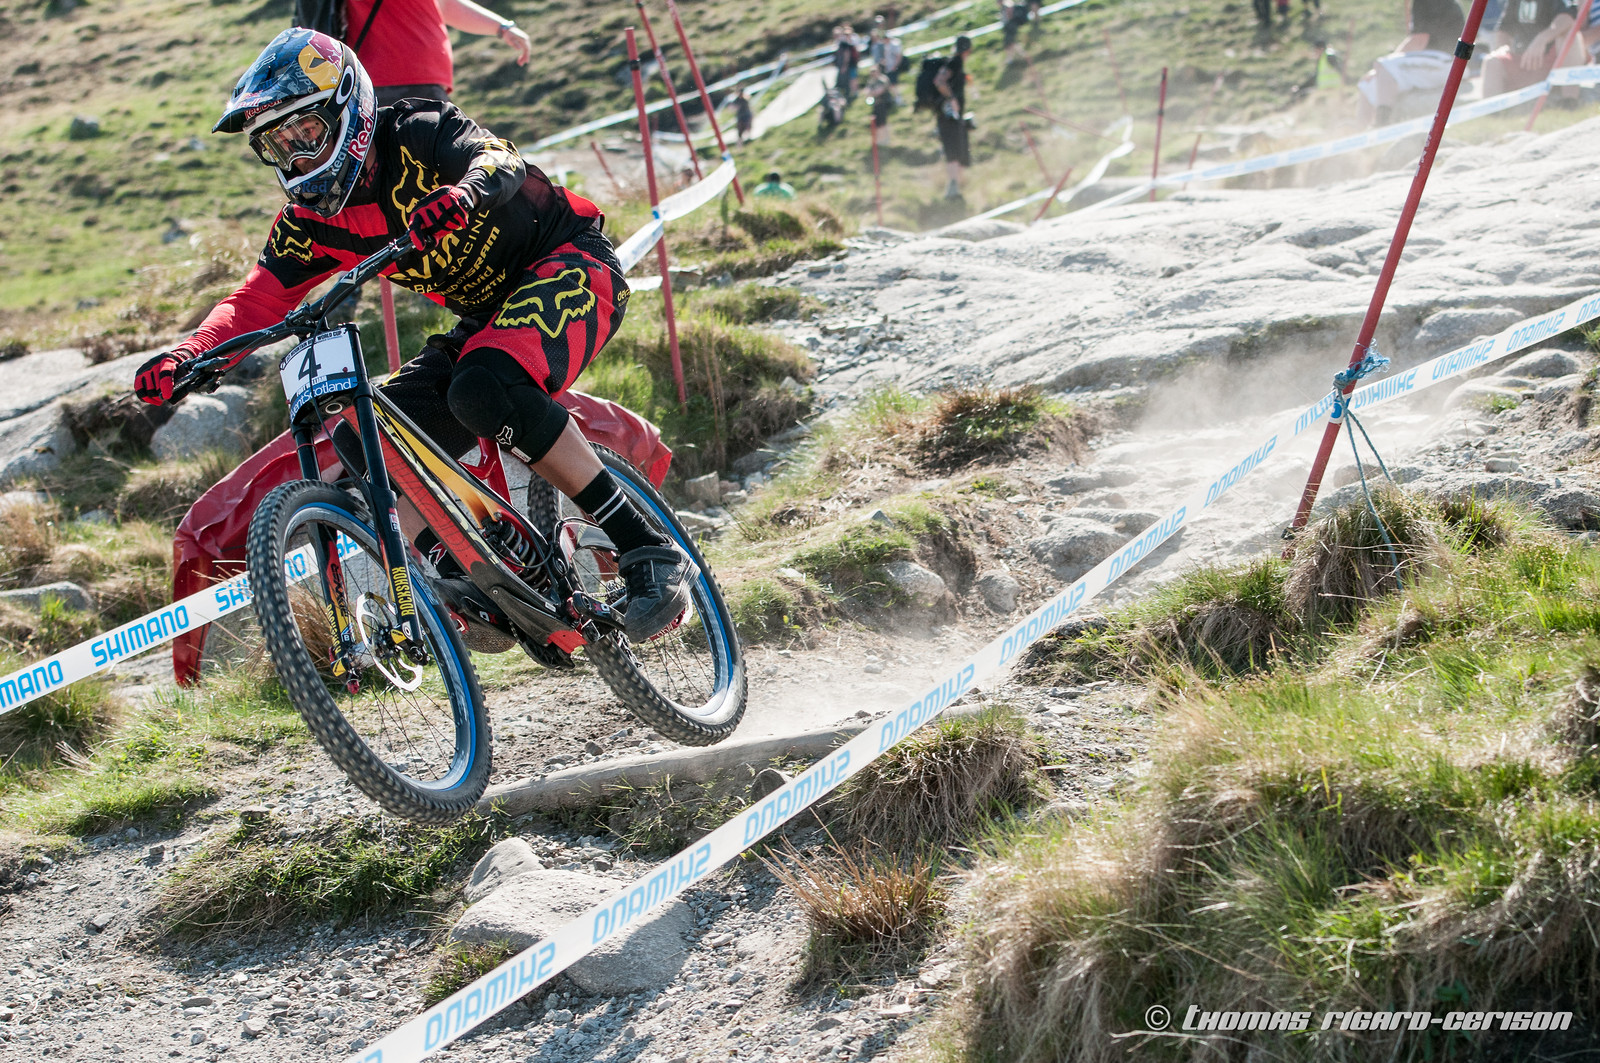 Steve Smith - Thomas Rigard-Cerison - Mountain Biking Pictures - Vital MTB